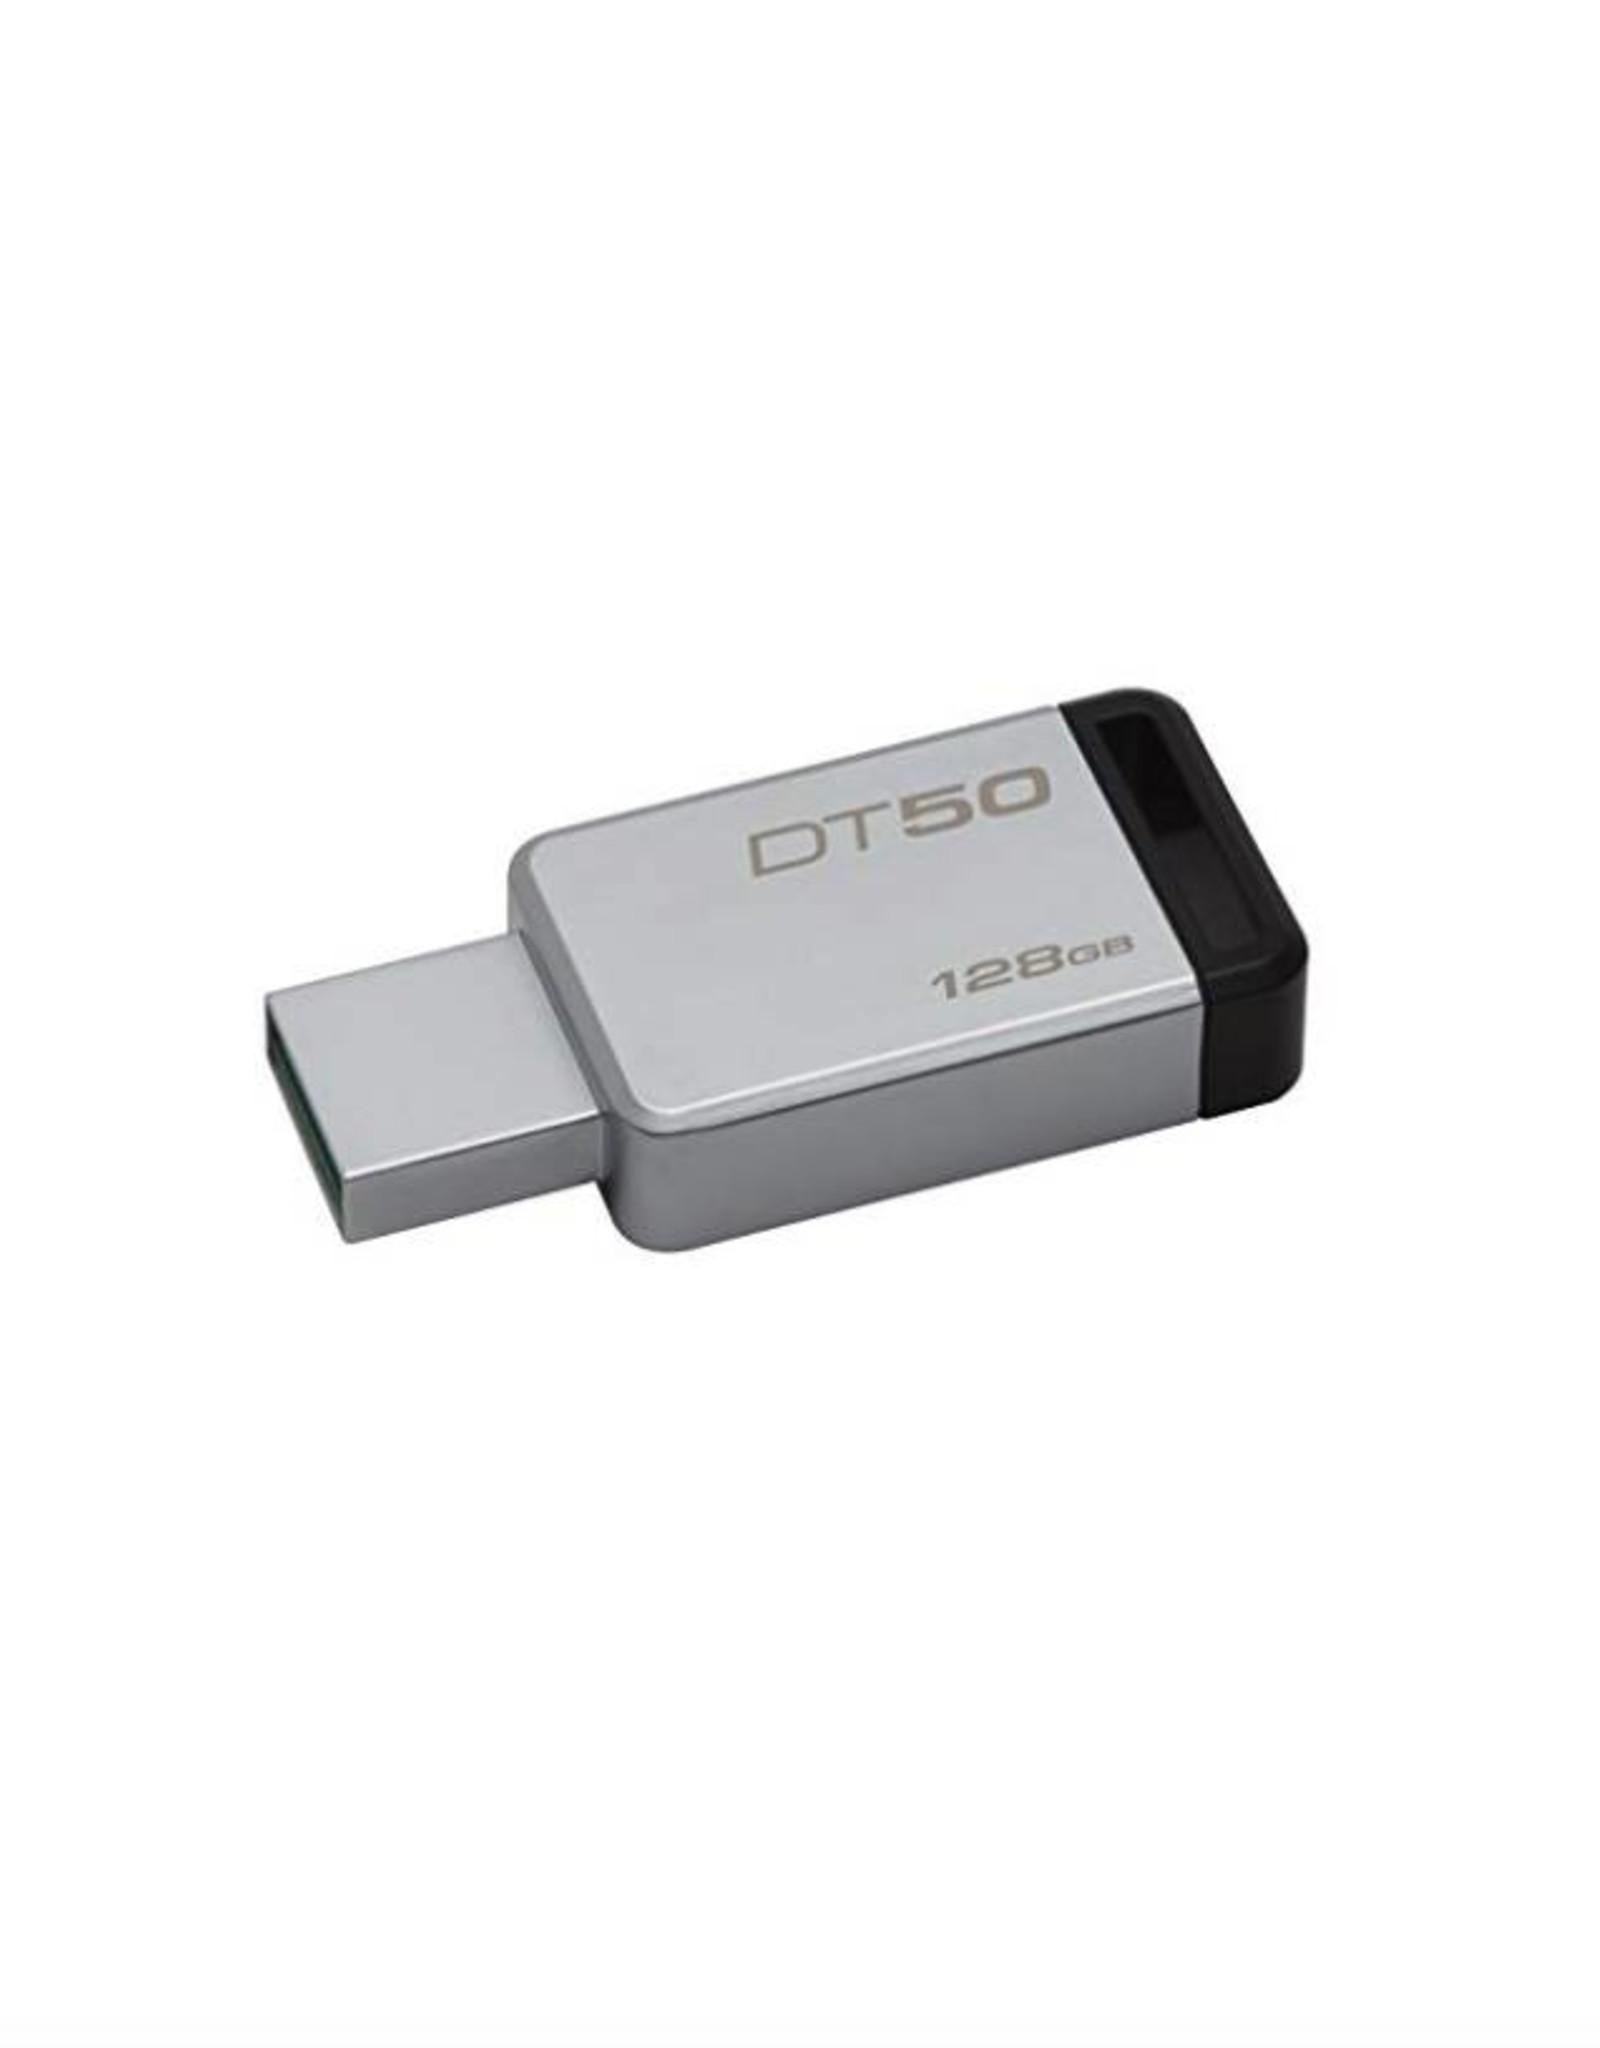 KINGSTON KINGSTON 128GB DATATRAVELER 50 USB 3.0 FLASH DRIVE